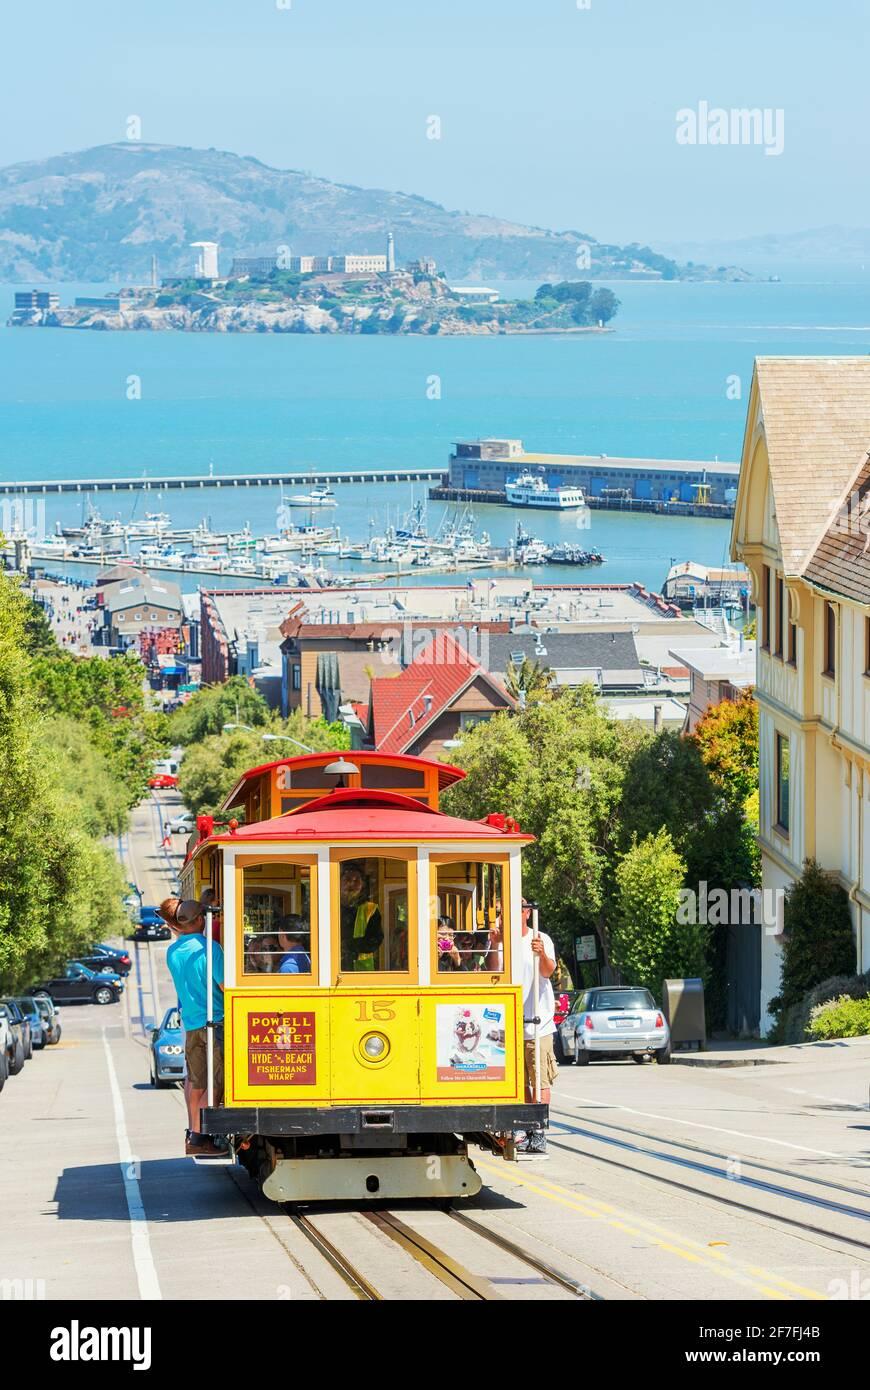 Cable Car-Linie Powell-Hyde mit Alcatraz Island im Hintergrund, San Francisco, Kalifornien, USA, Nordamerika Stockfoto